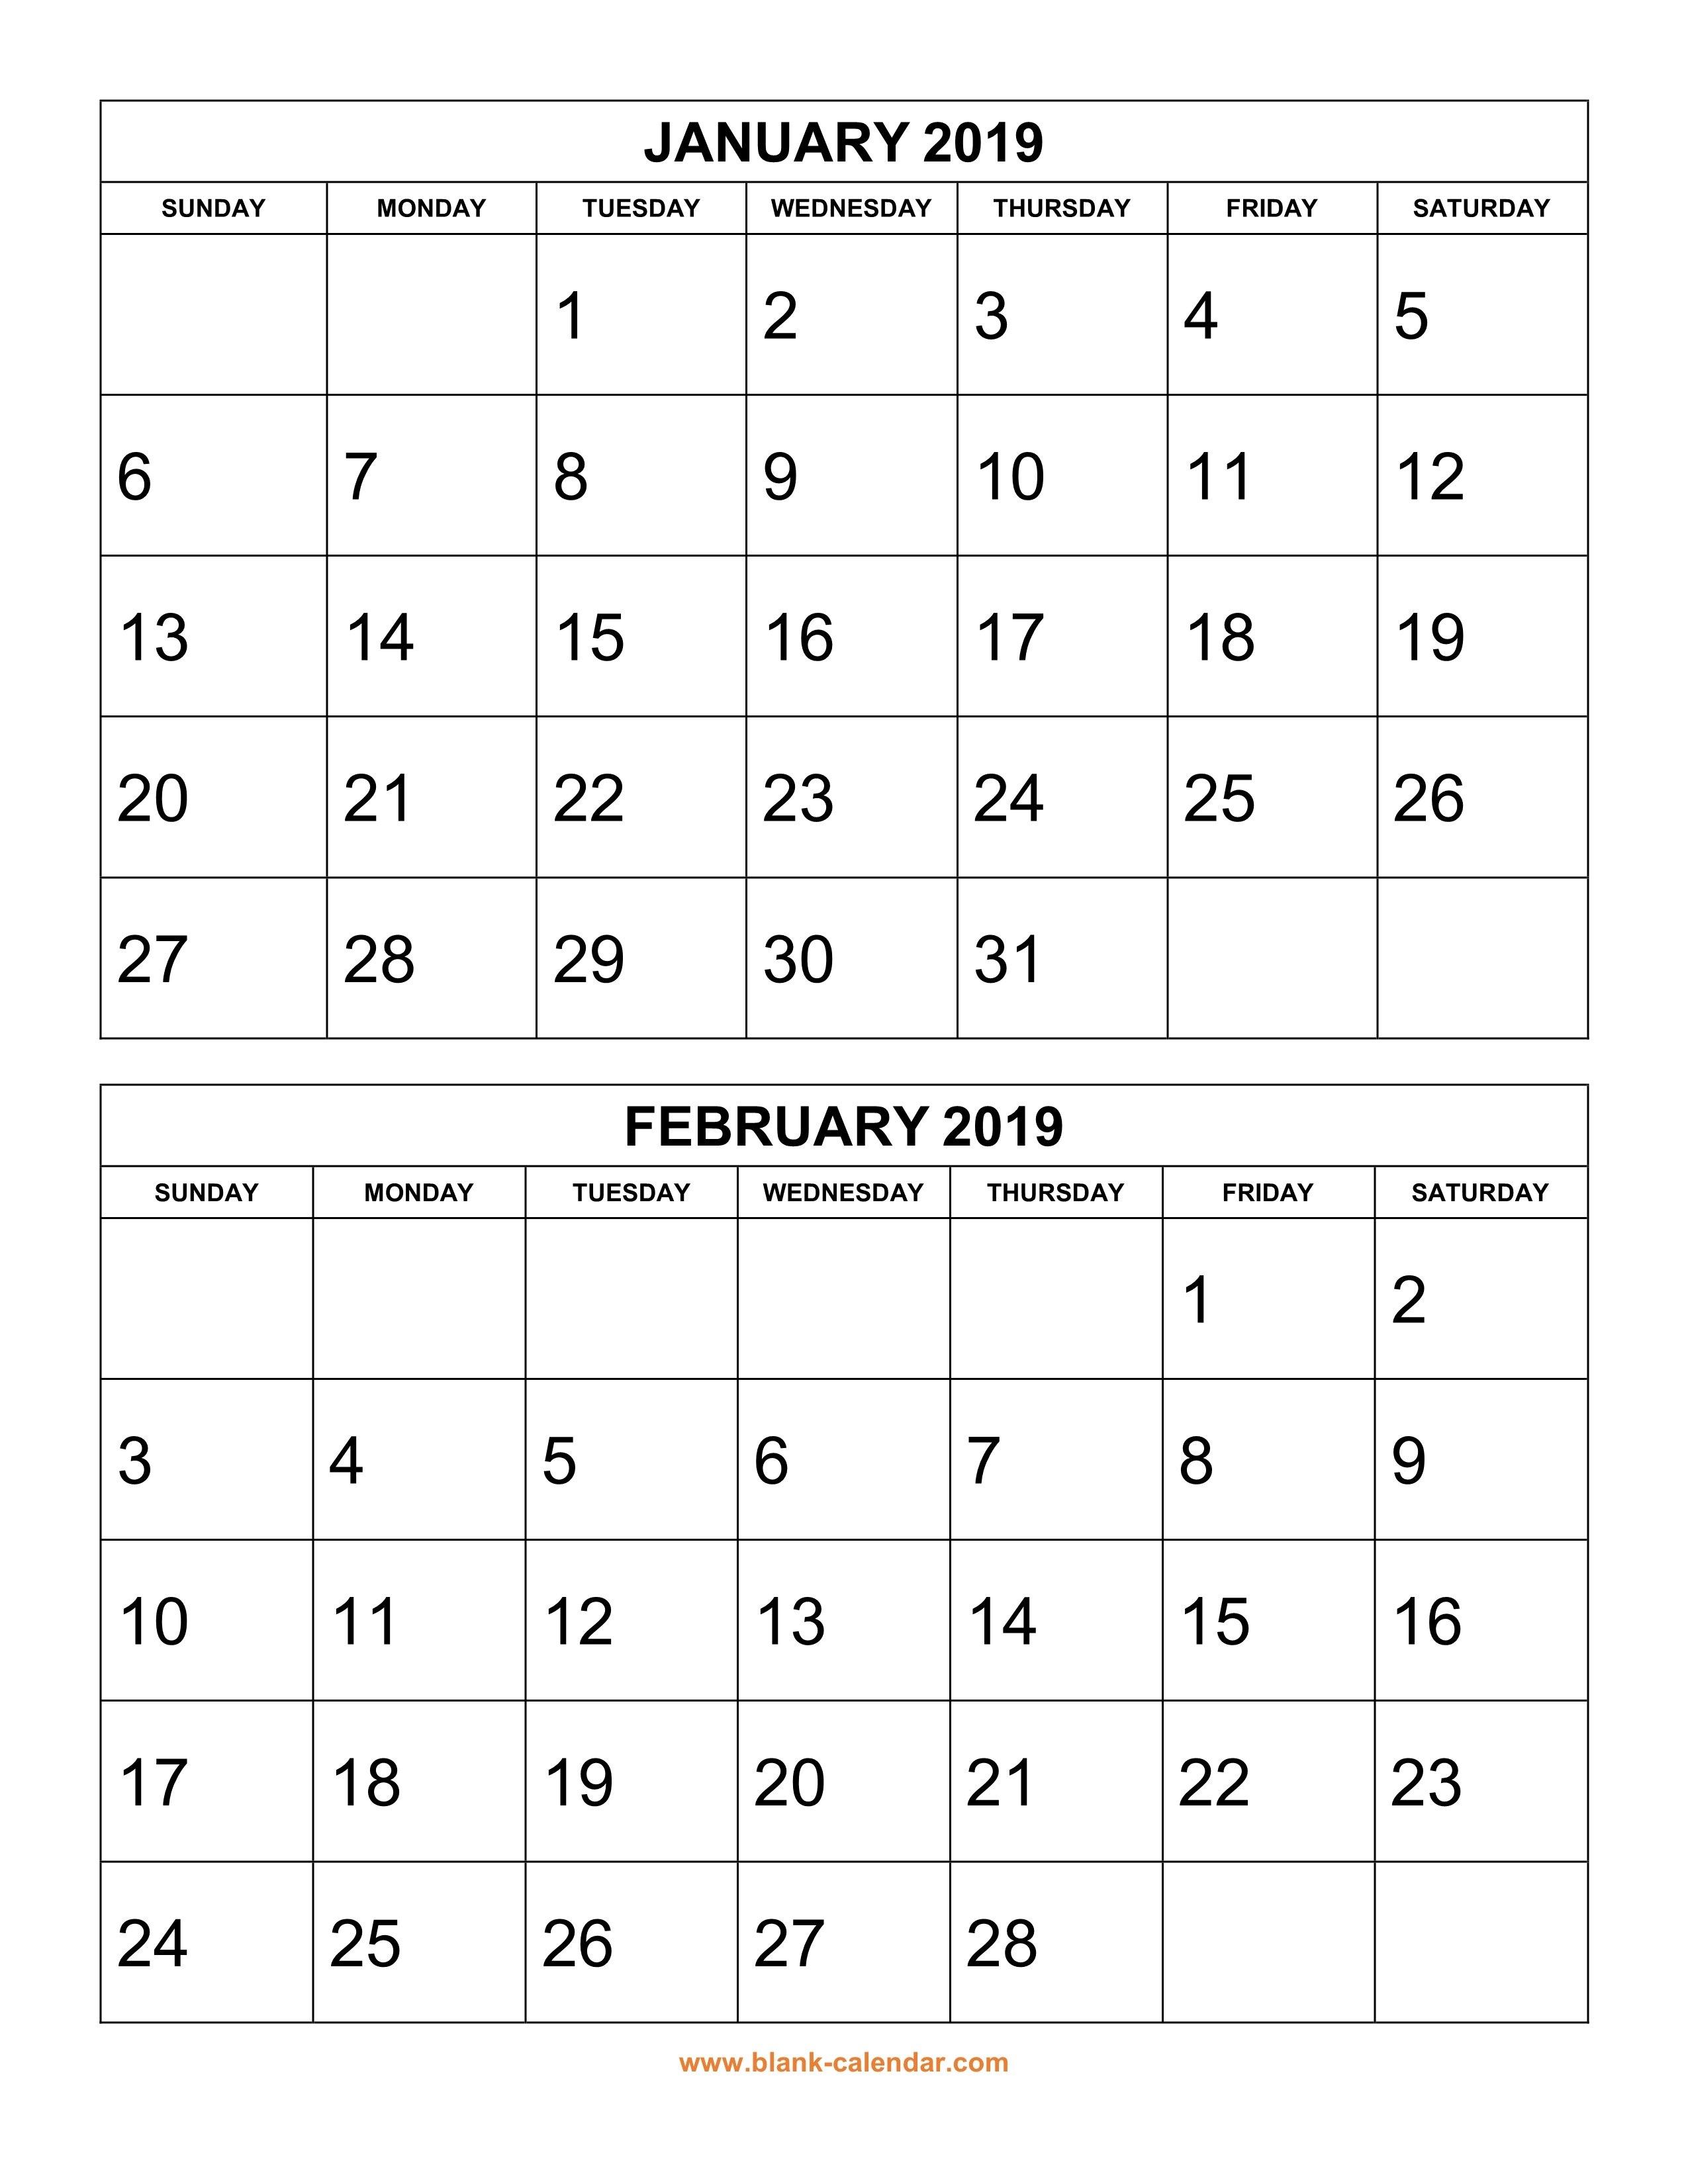 Free Download Printable Calendar 2019, 2 Months Per Page, 6 Pages Calendar 2019 Printable Free